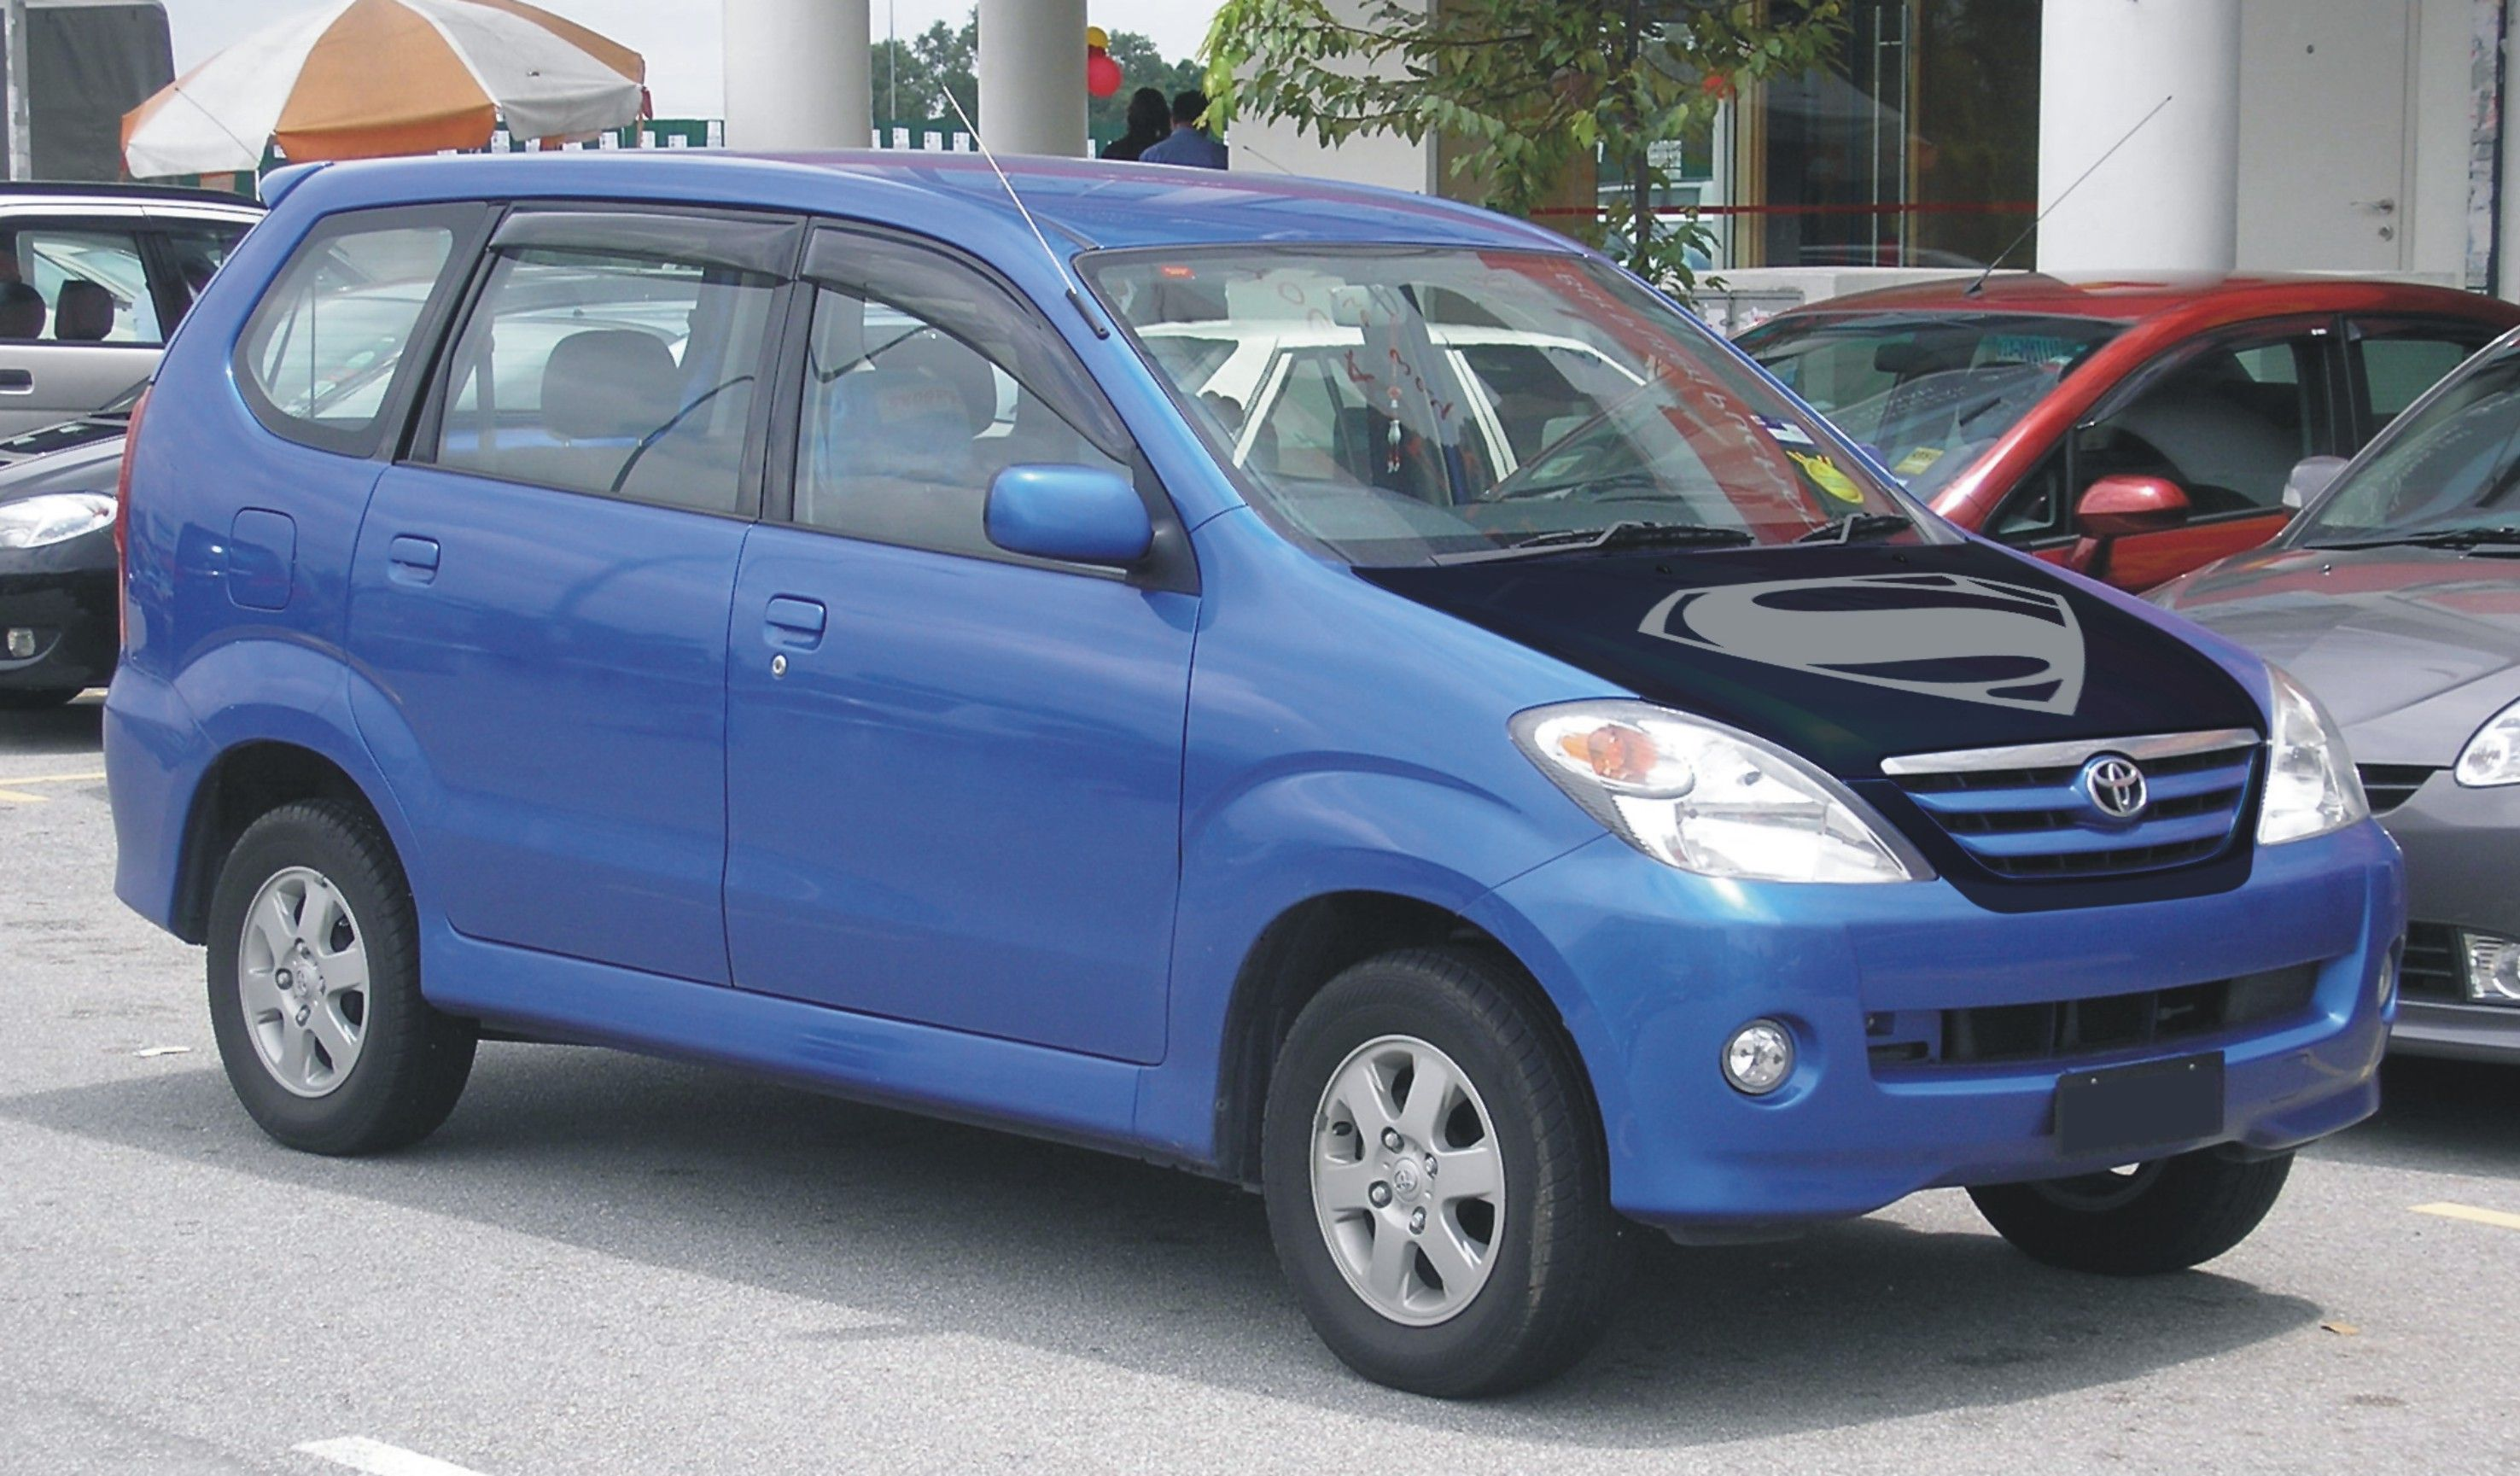 Blue car sticker design - Toyota Avanza Blue Black Mate Front Hood Grill Wrapping Superman Logo Sticker Concept